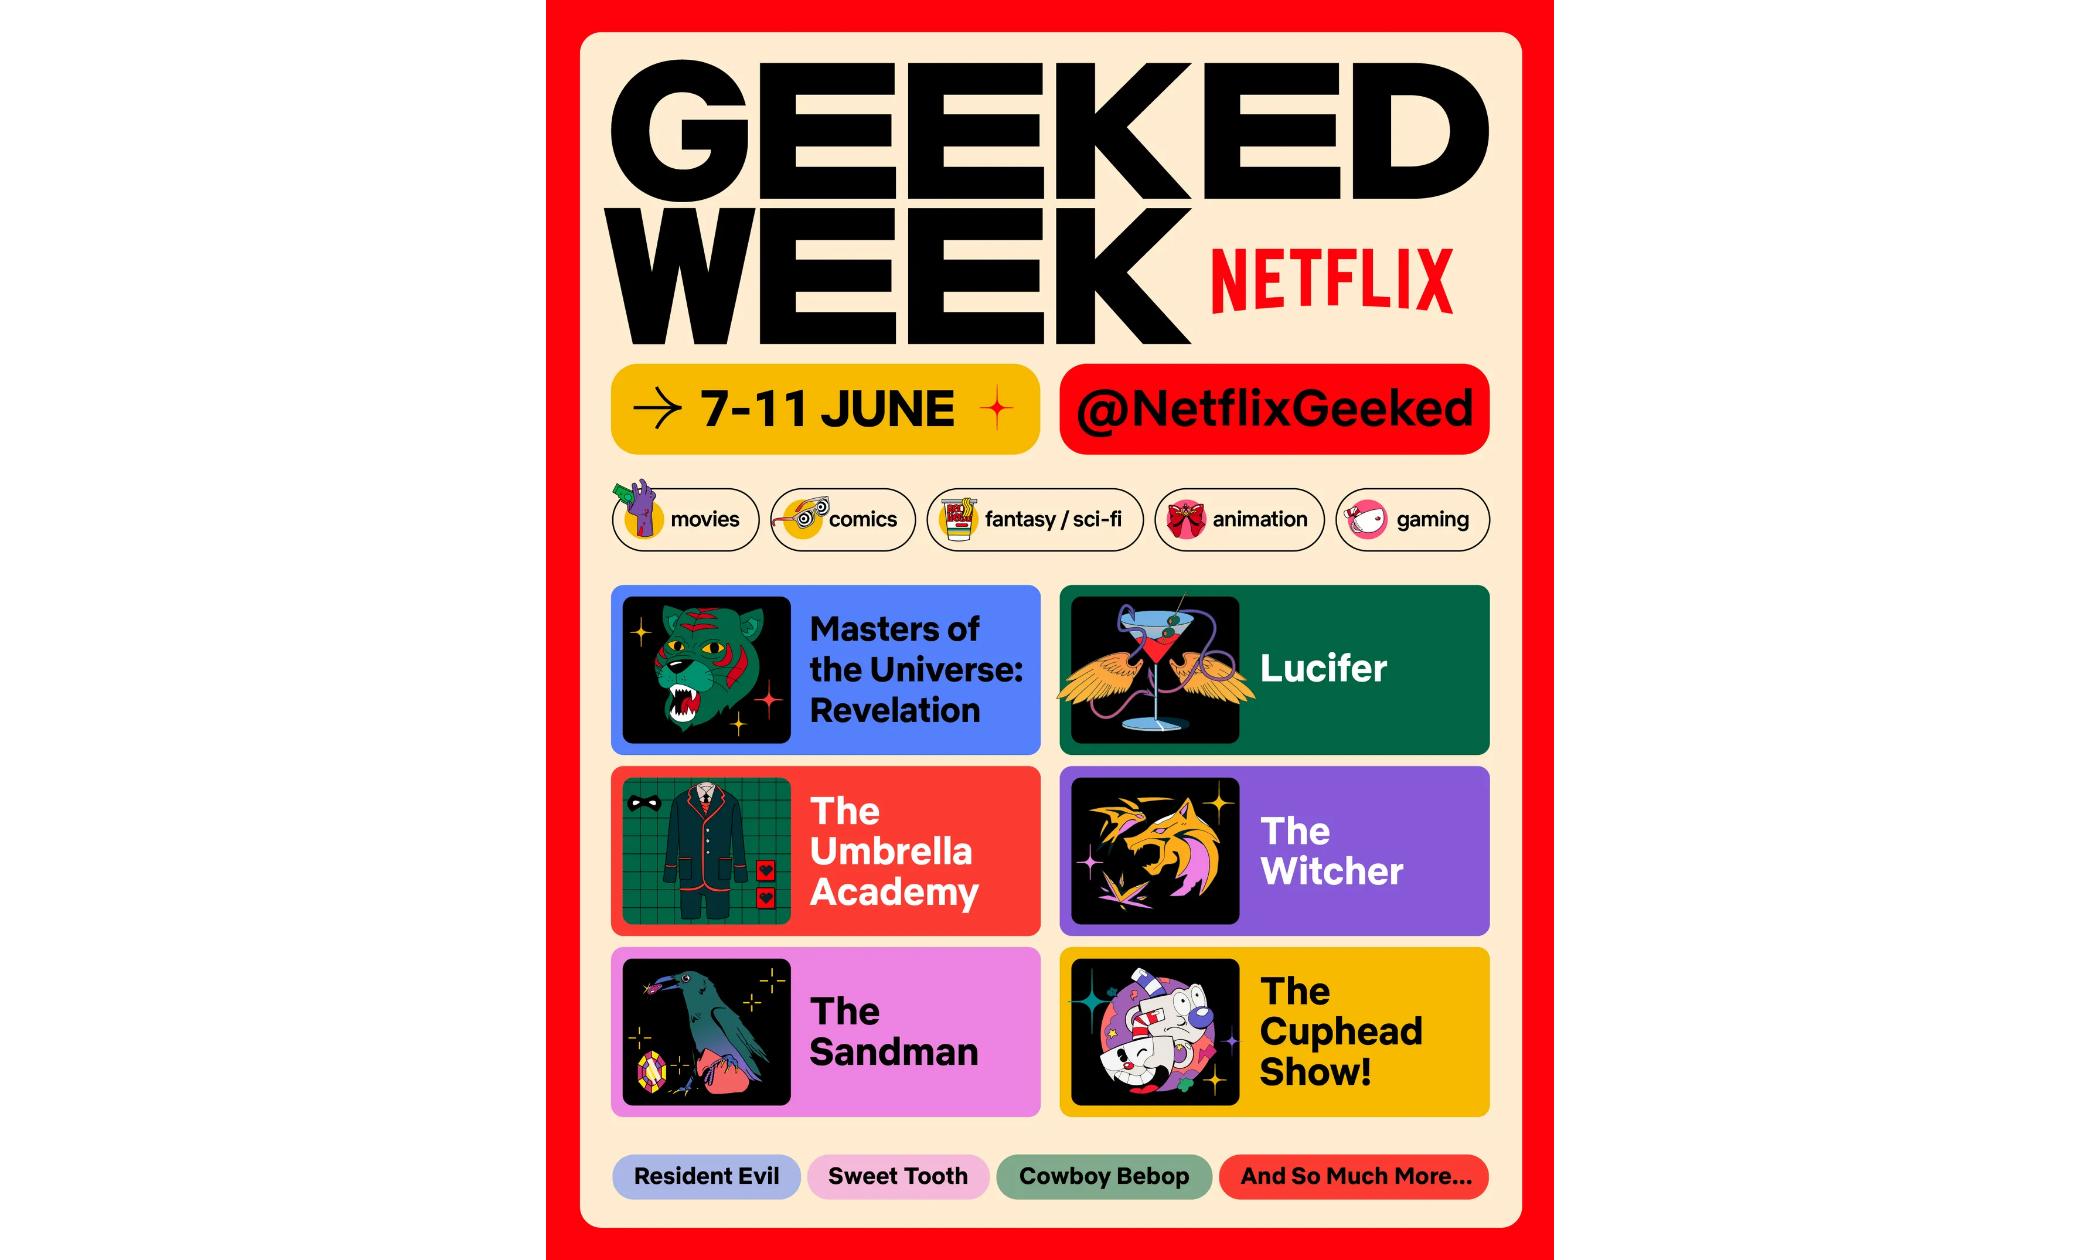 Netflix 发布预告,将举办一场为期一周的虚拟活动